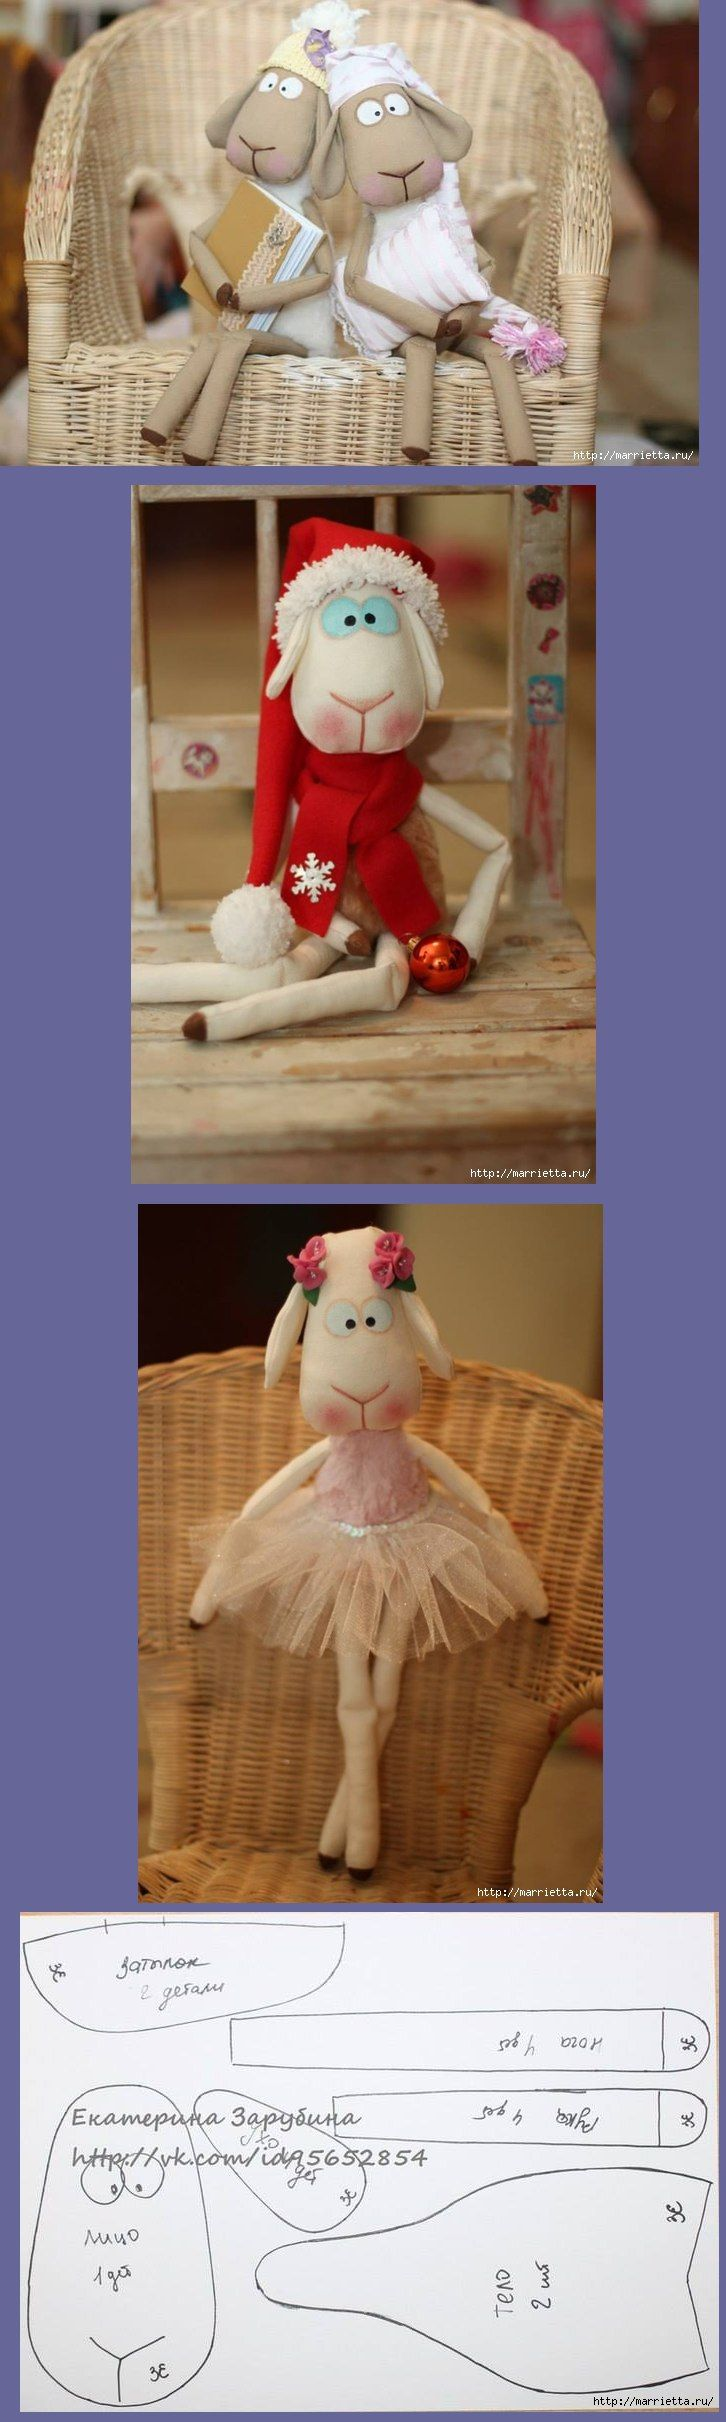 Sheepish Grins family